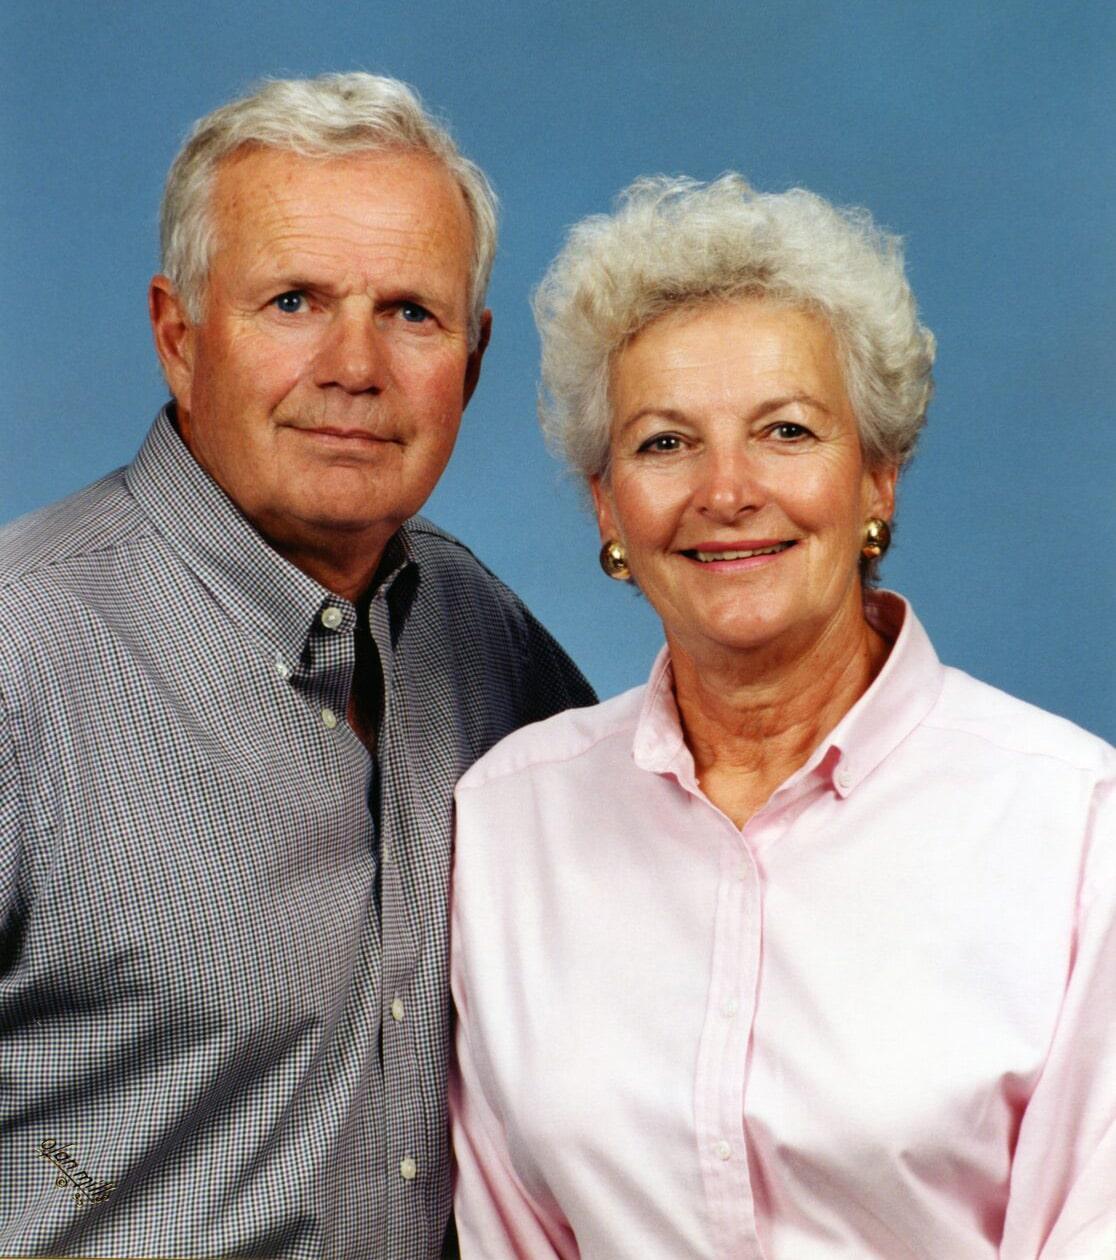 Bob and Carol Reese of Springfield Armory